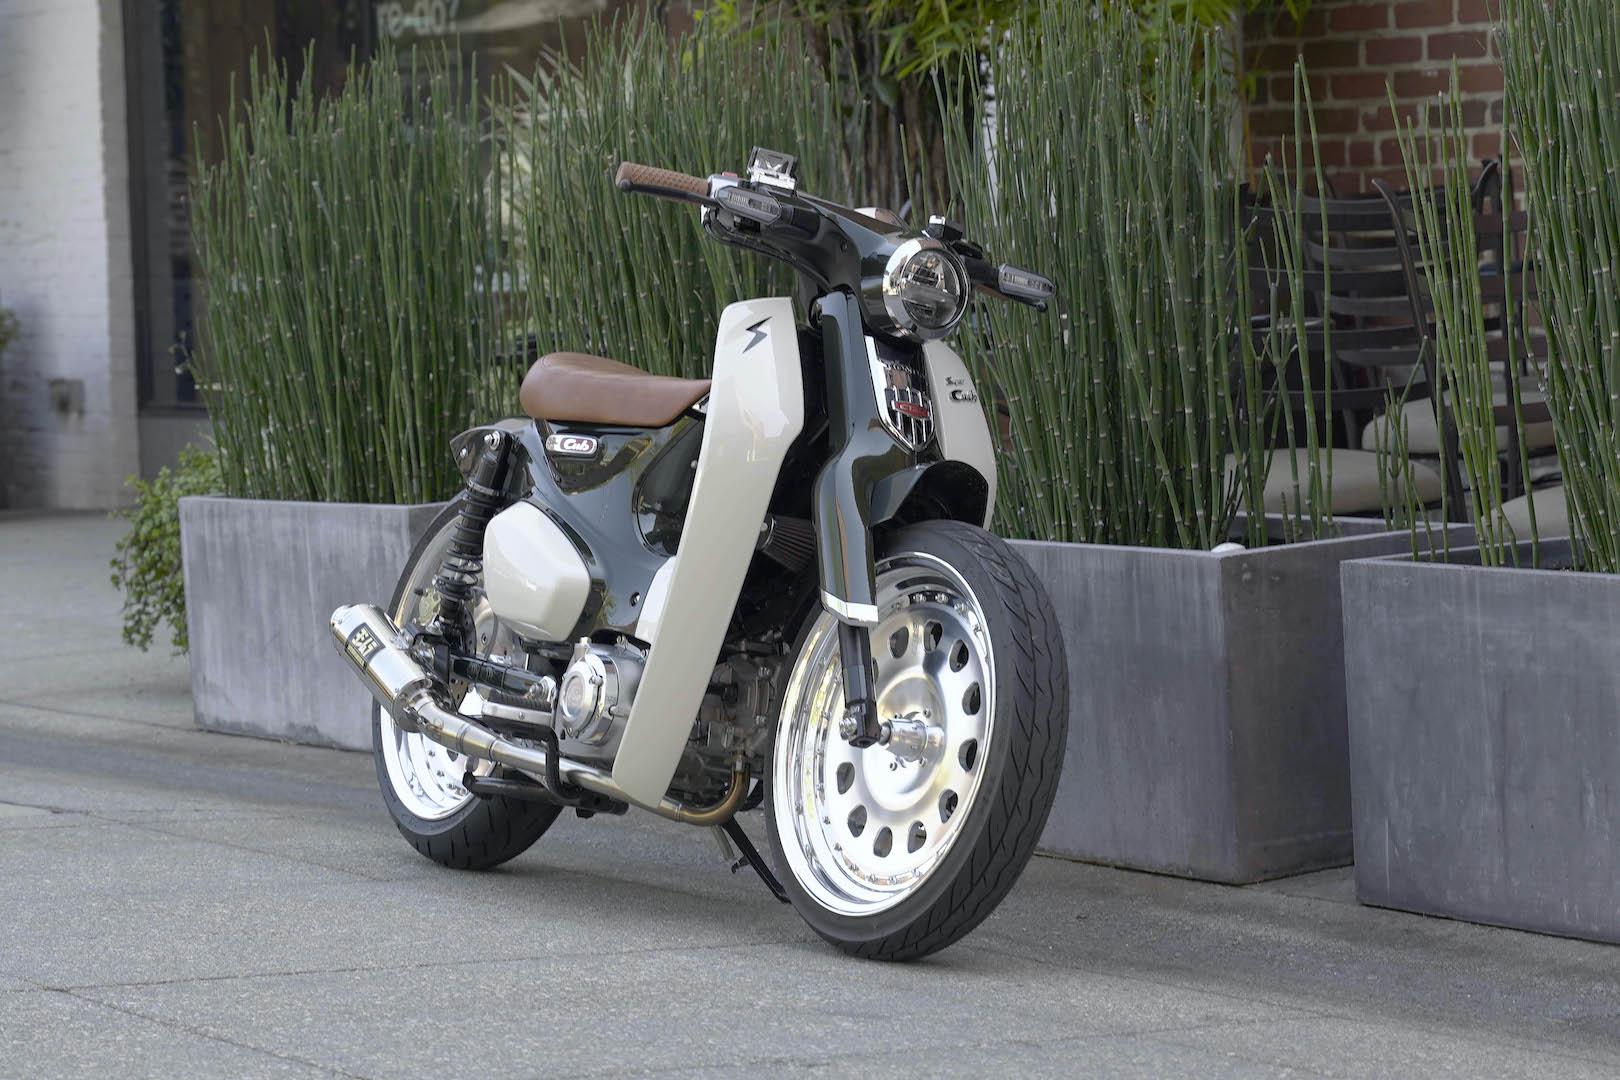 Three Must-See Unexpected Honda Customs: Cub, Monkey, CRF450L